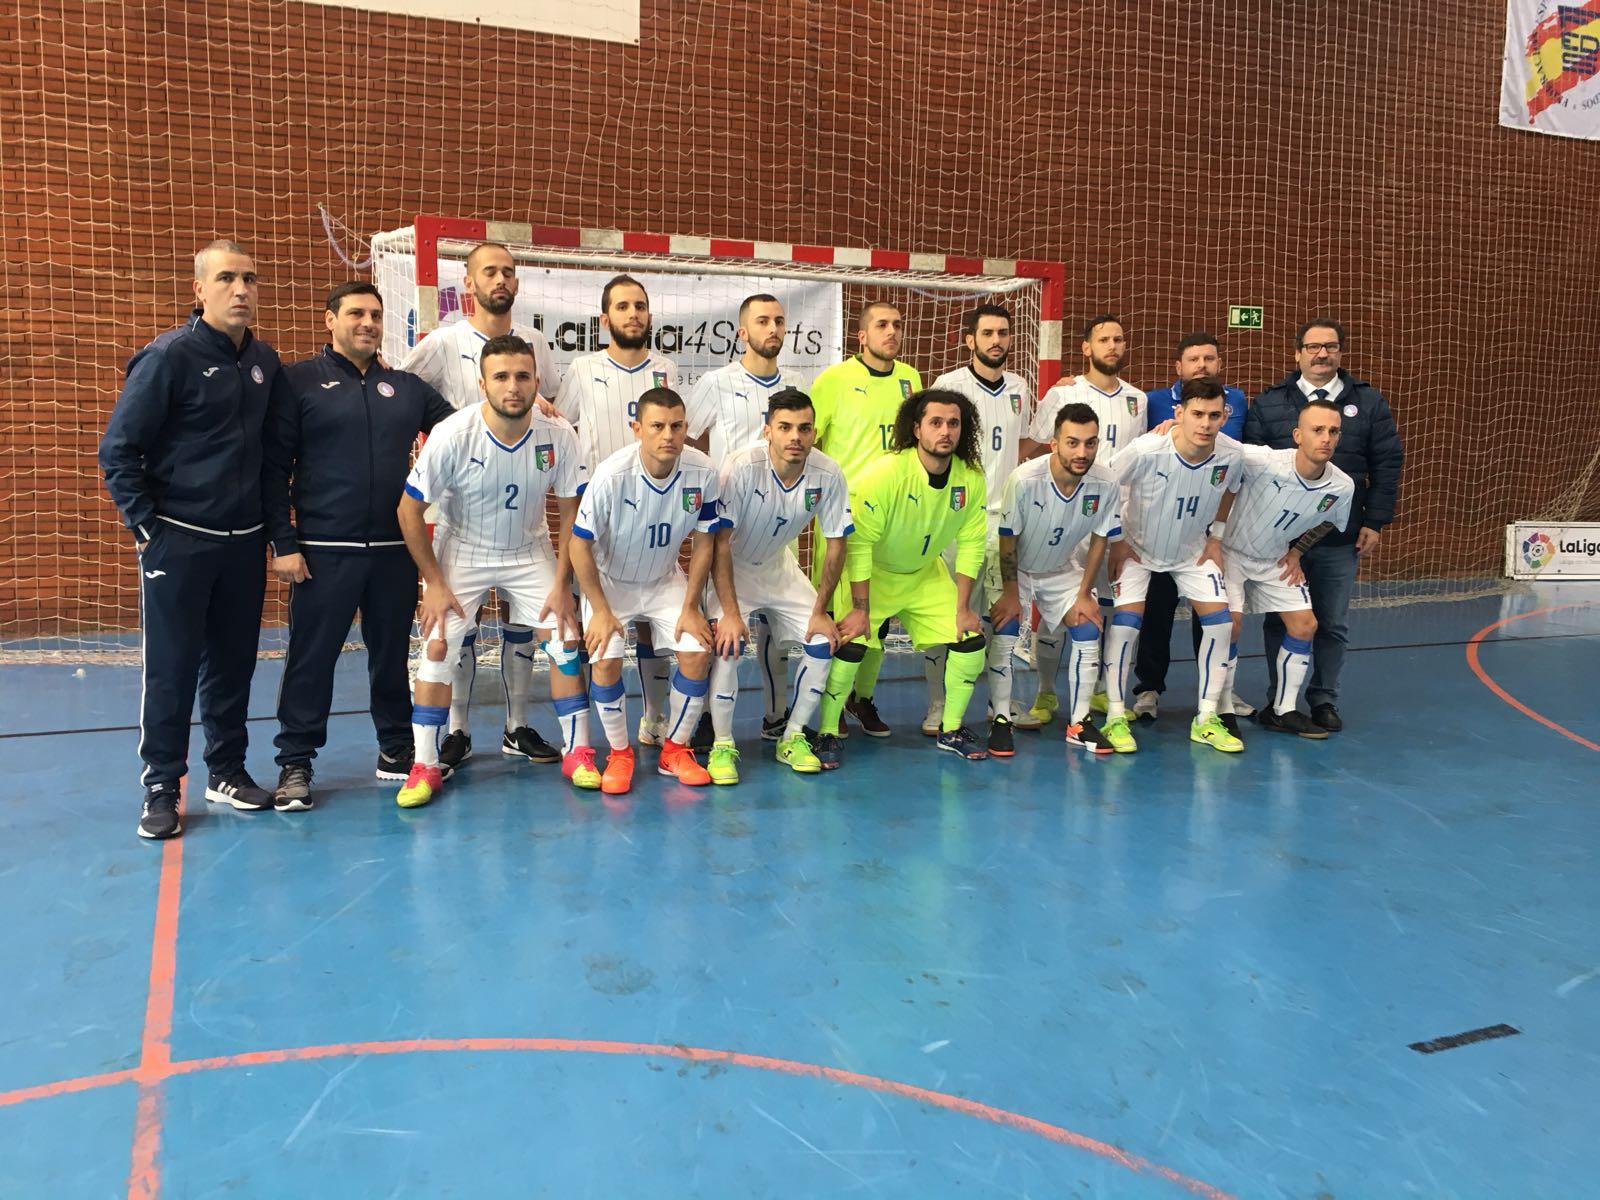 Qualificazione Europei Futsal – Madrid 7-9 Dicembre 2017